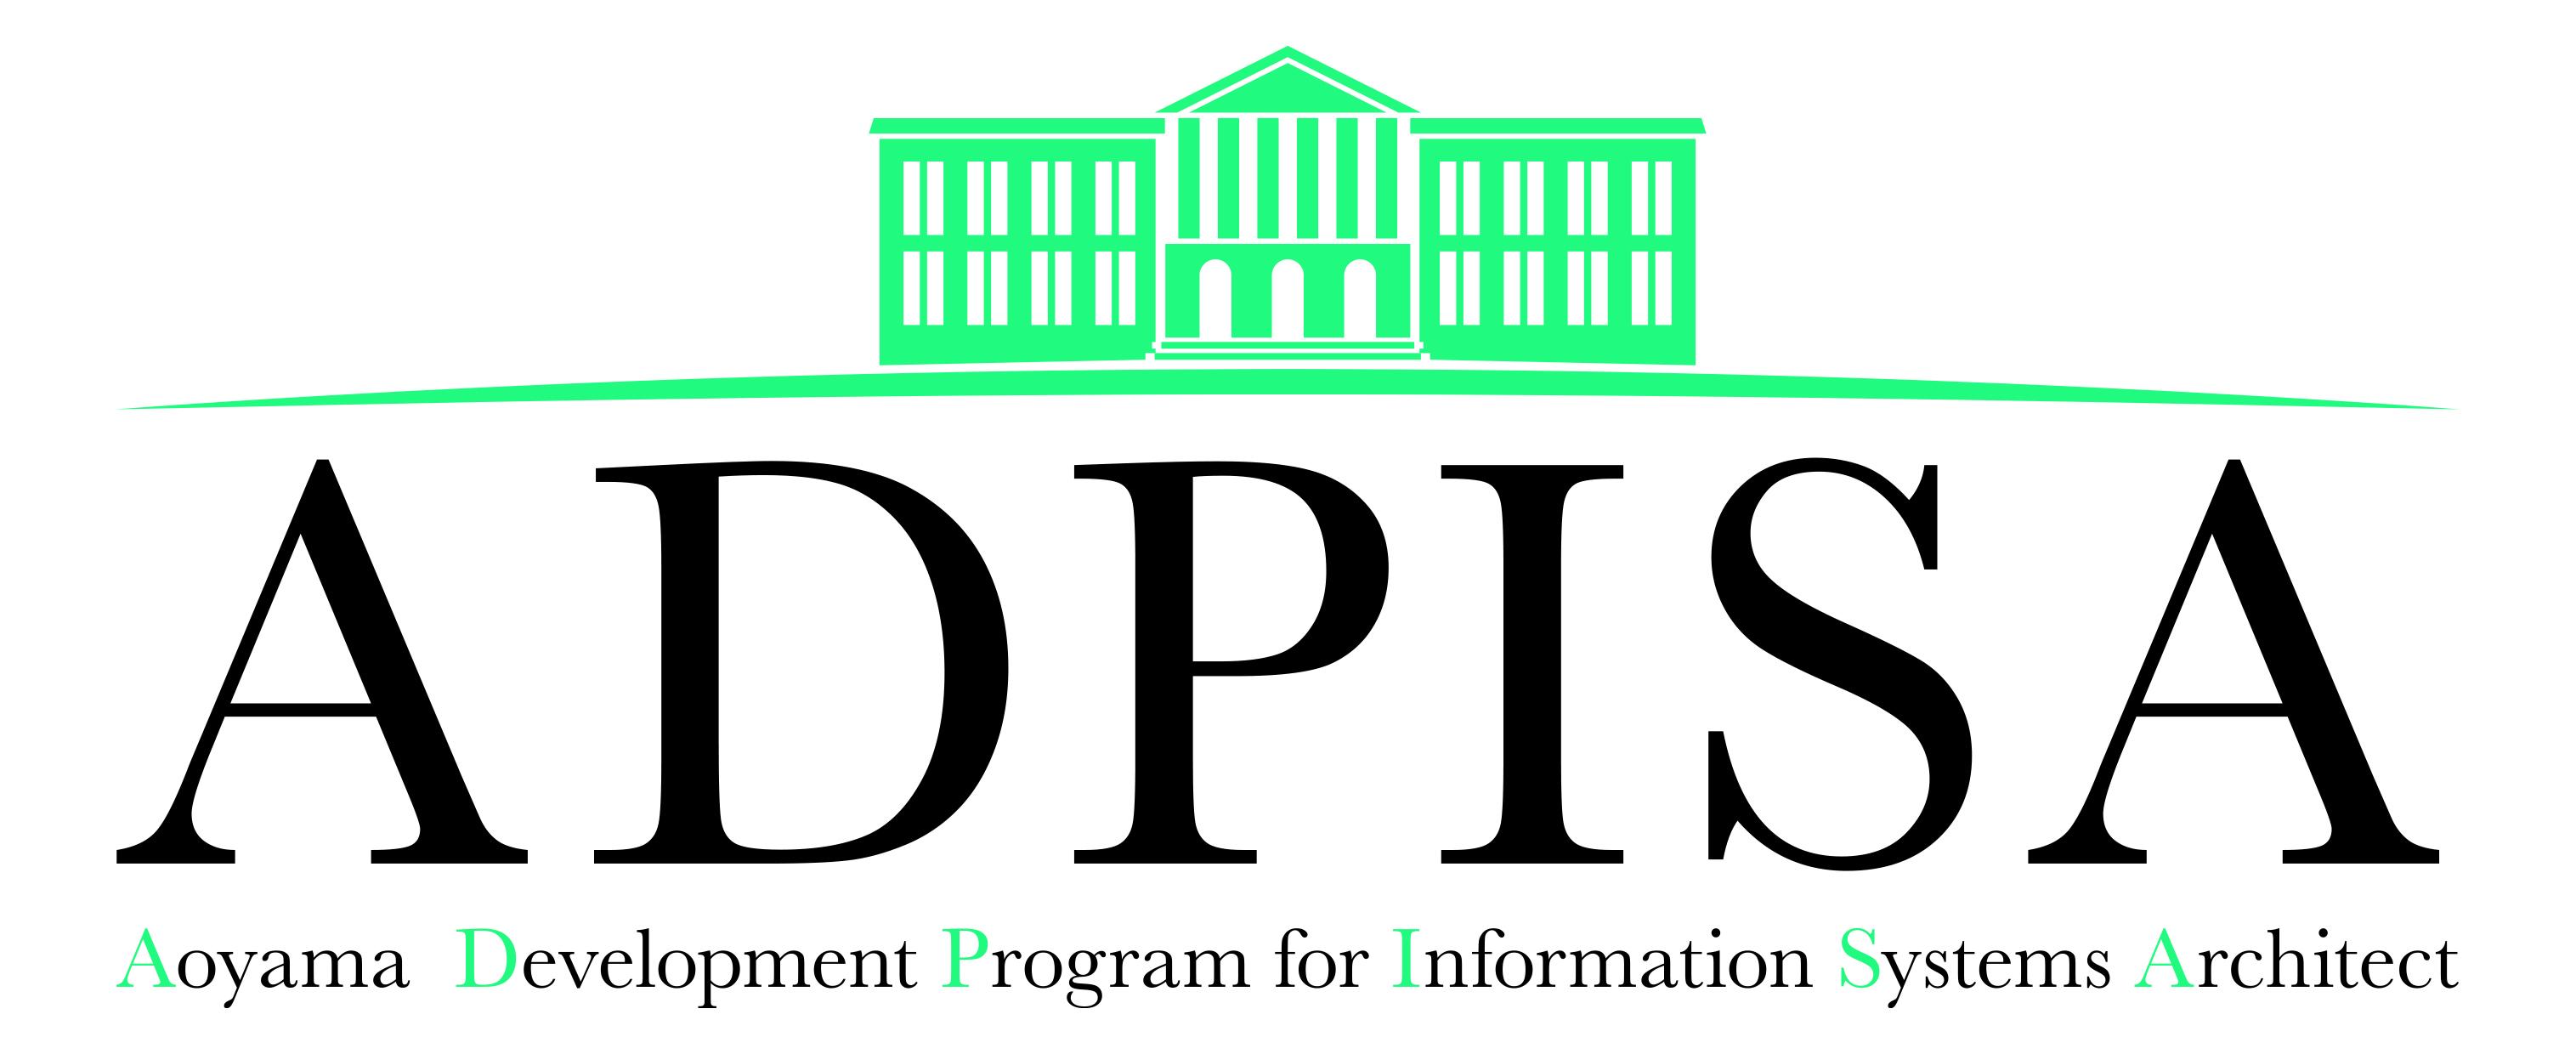 ADPISA_logo_A.JPG